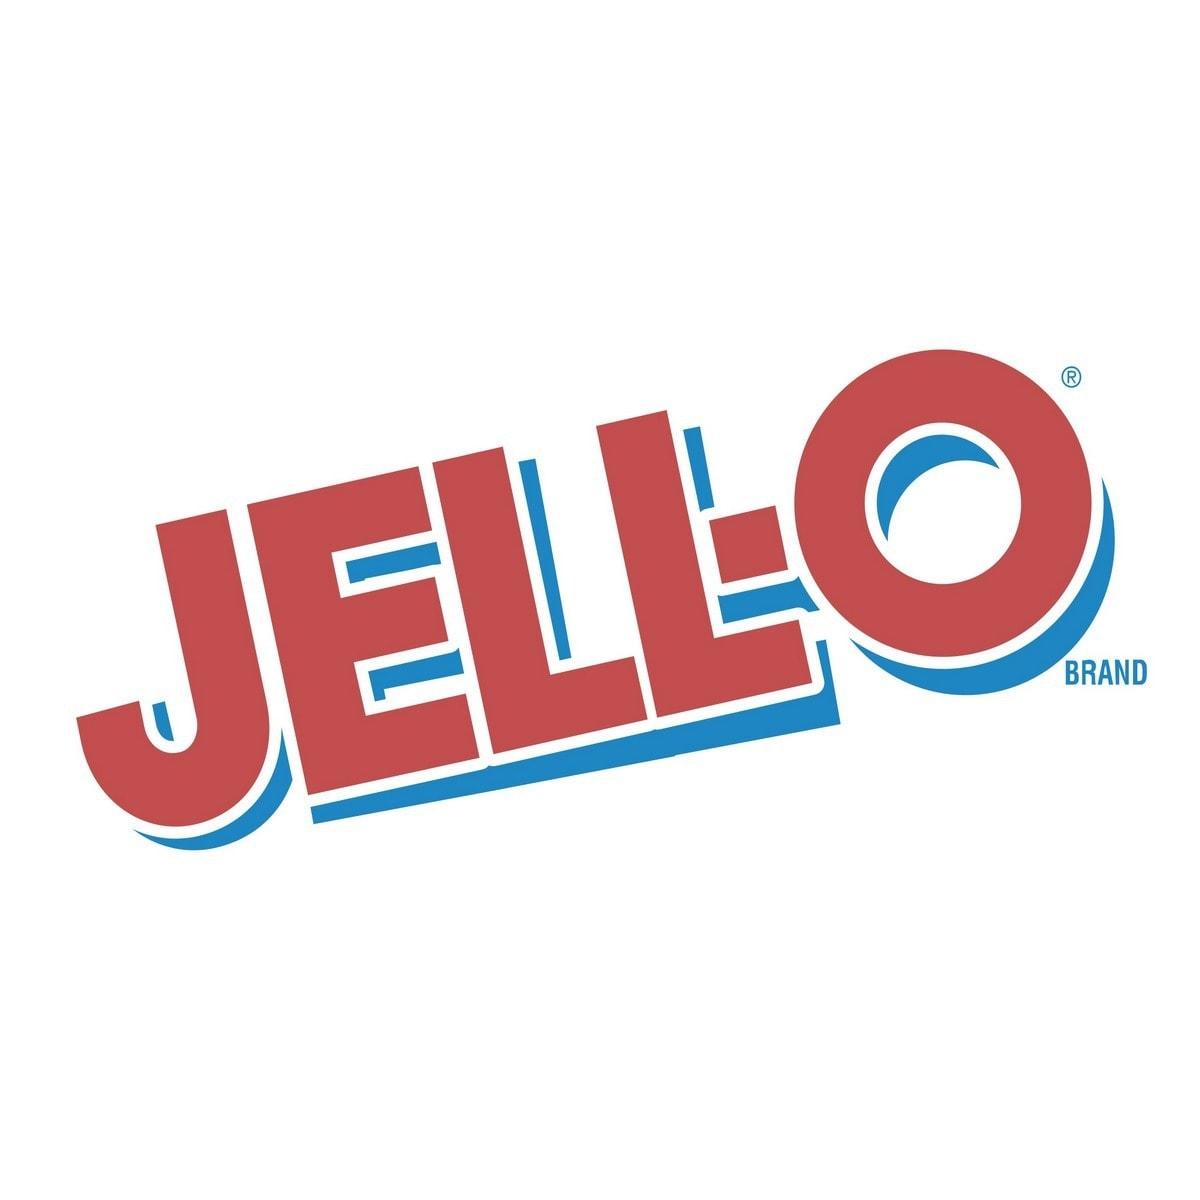 Marketing Mix Of Jell-O